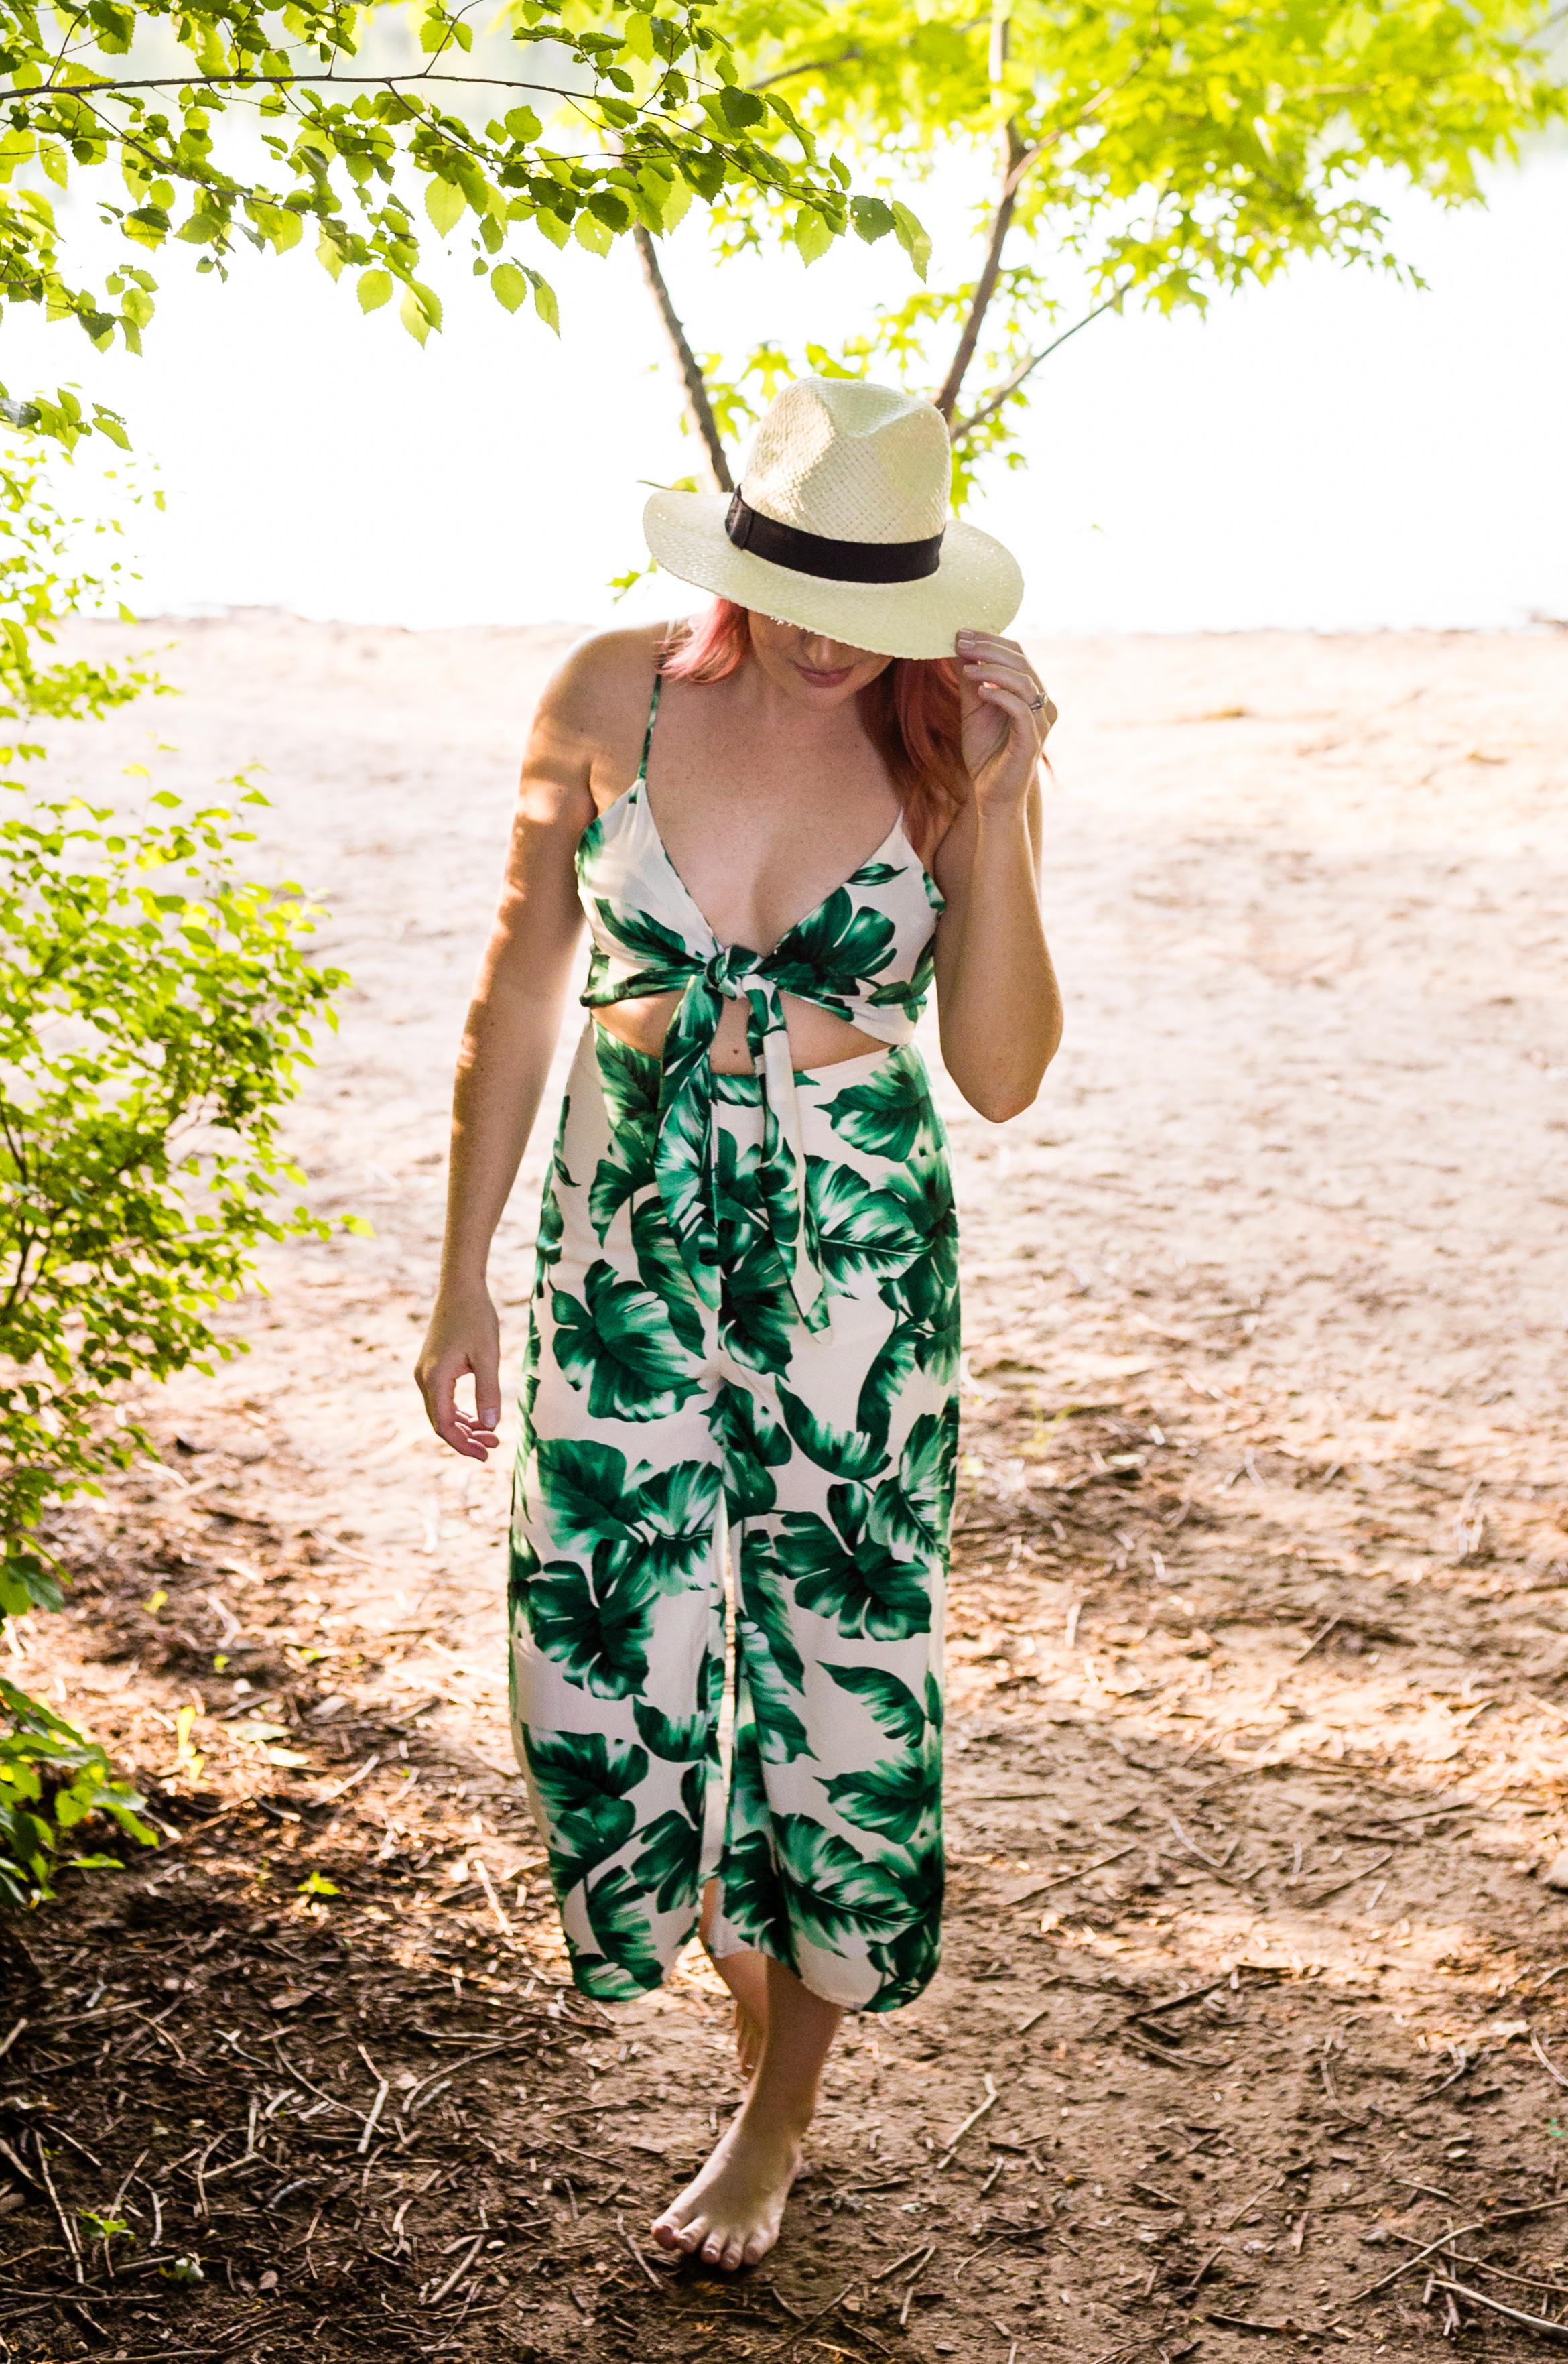 Magnolia Palm Lifestyle_Waneka Lake (9 of 15).jpg